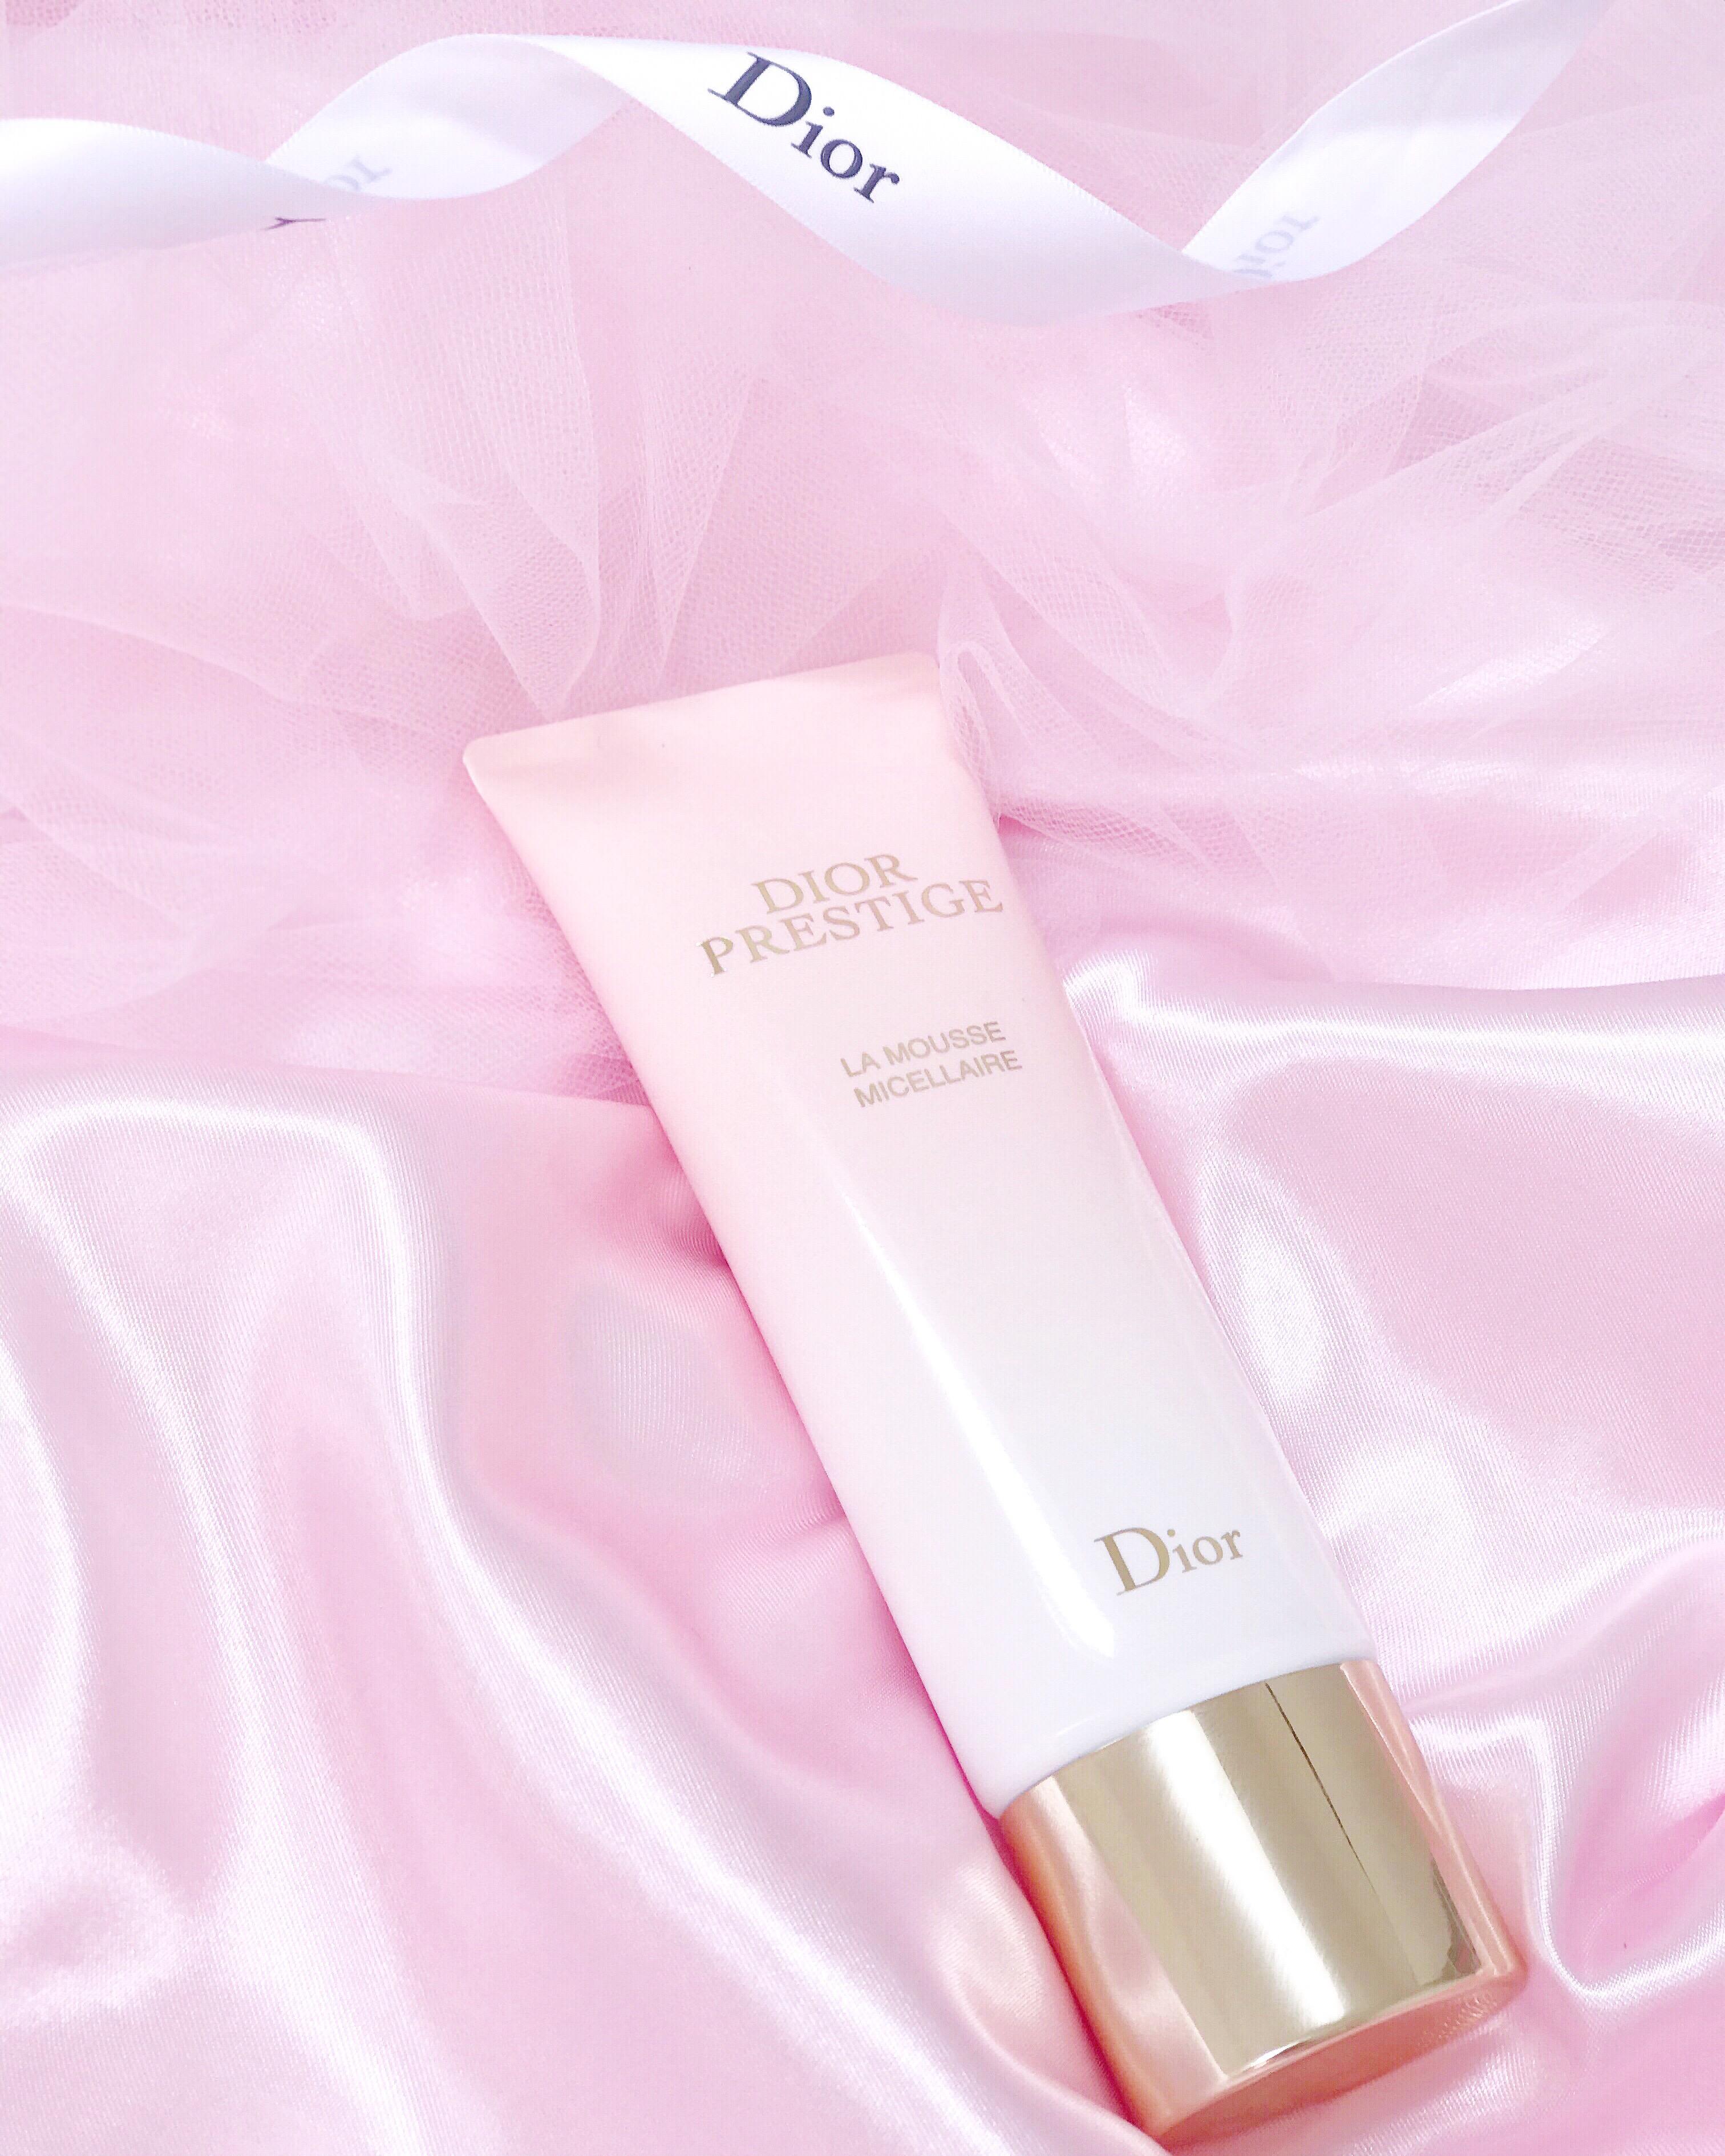 Oh So Heavenly Rose Petal Skin New Dior Prestige La Mousse Micellaire Freya S Fairytale